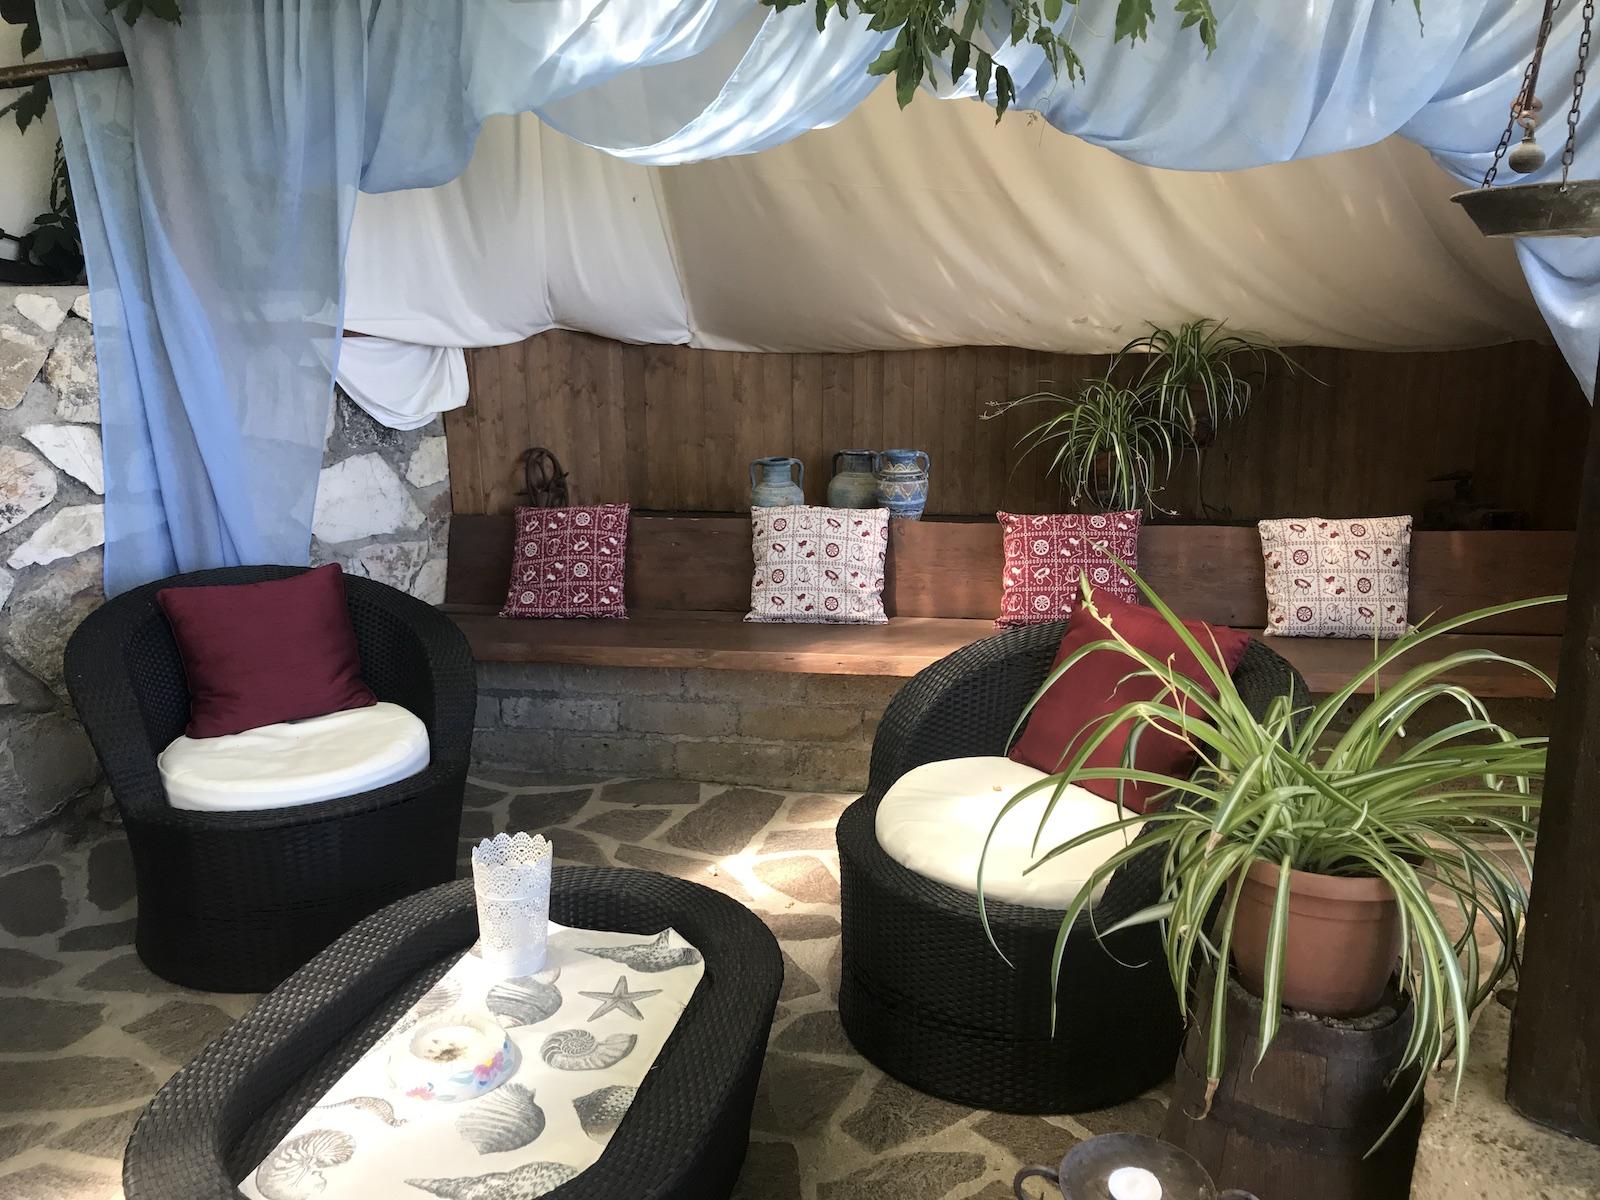 tourameo-elba-reise-welches-hotel-wahl